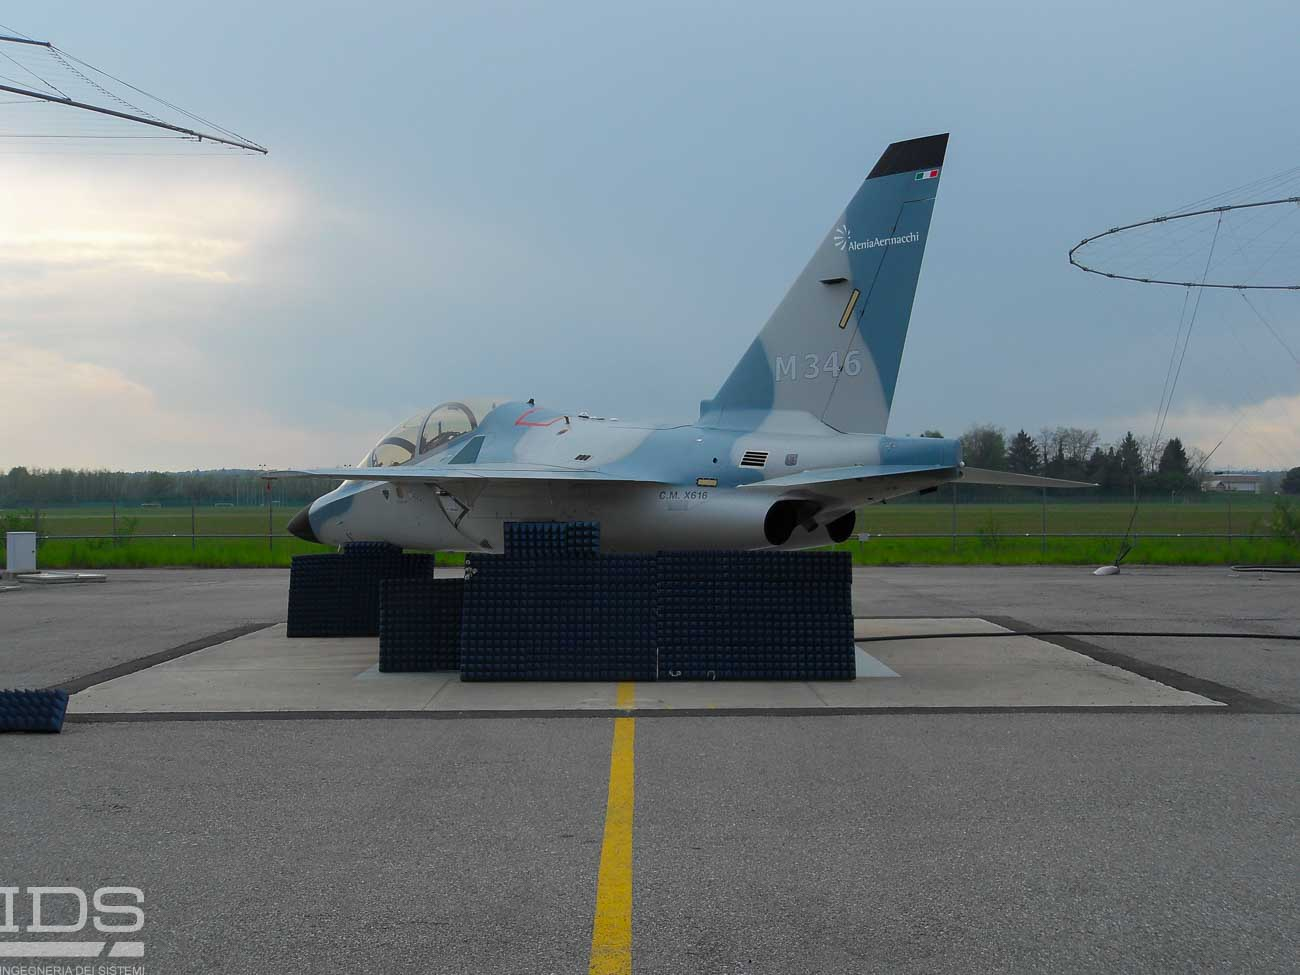 RCS Measurement of Aircraft